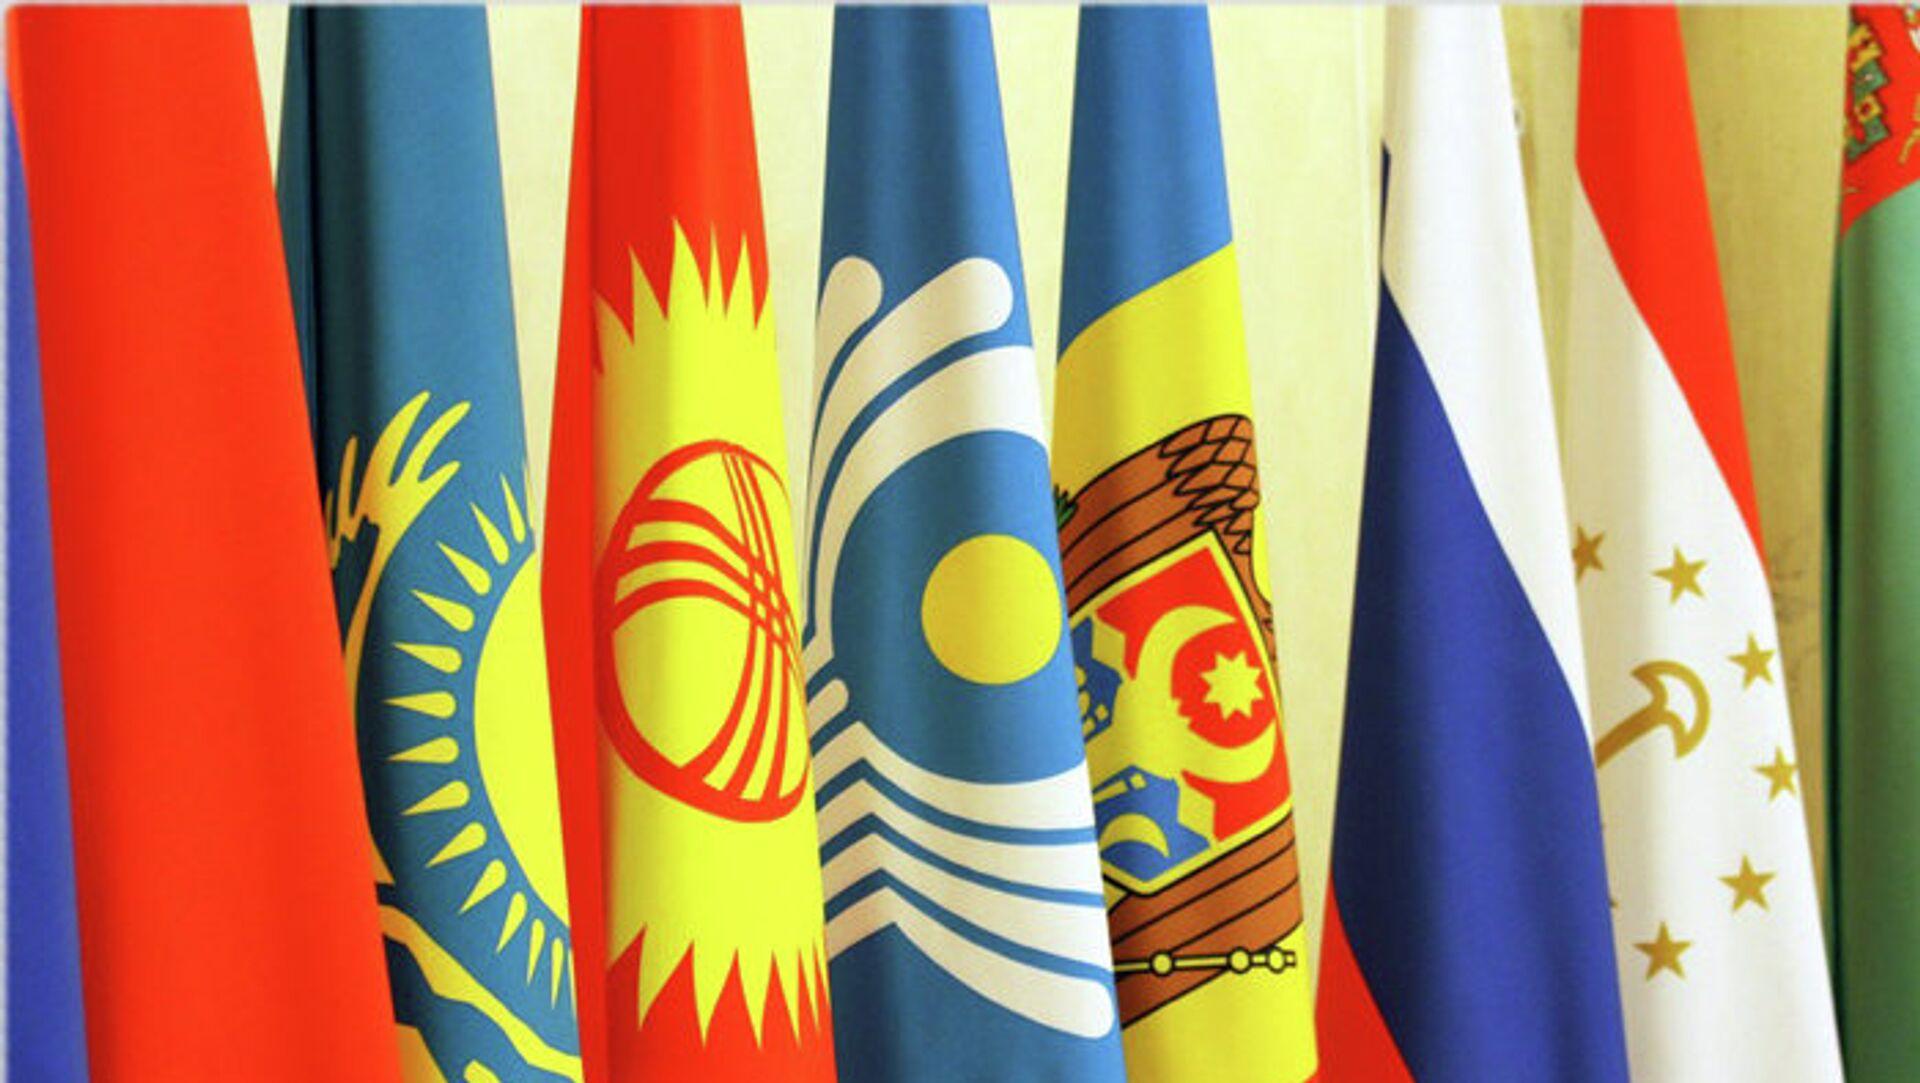 Флаги участниц СНГ  - Sputnik Азербайджан, 1920, 13.10.2021